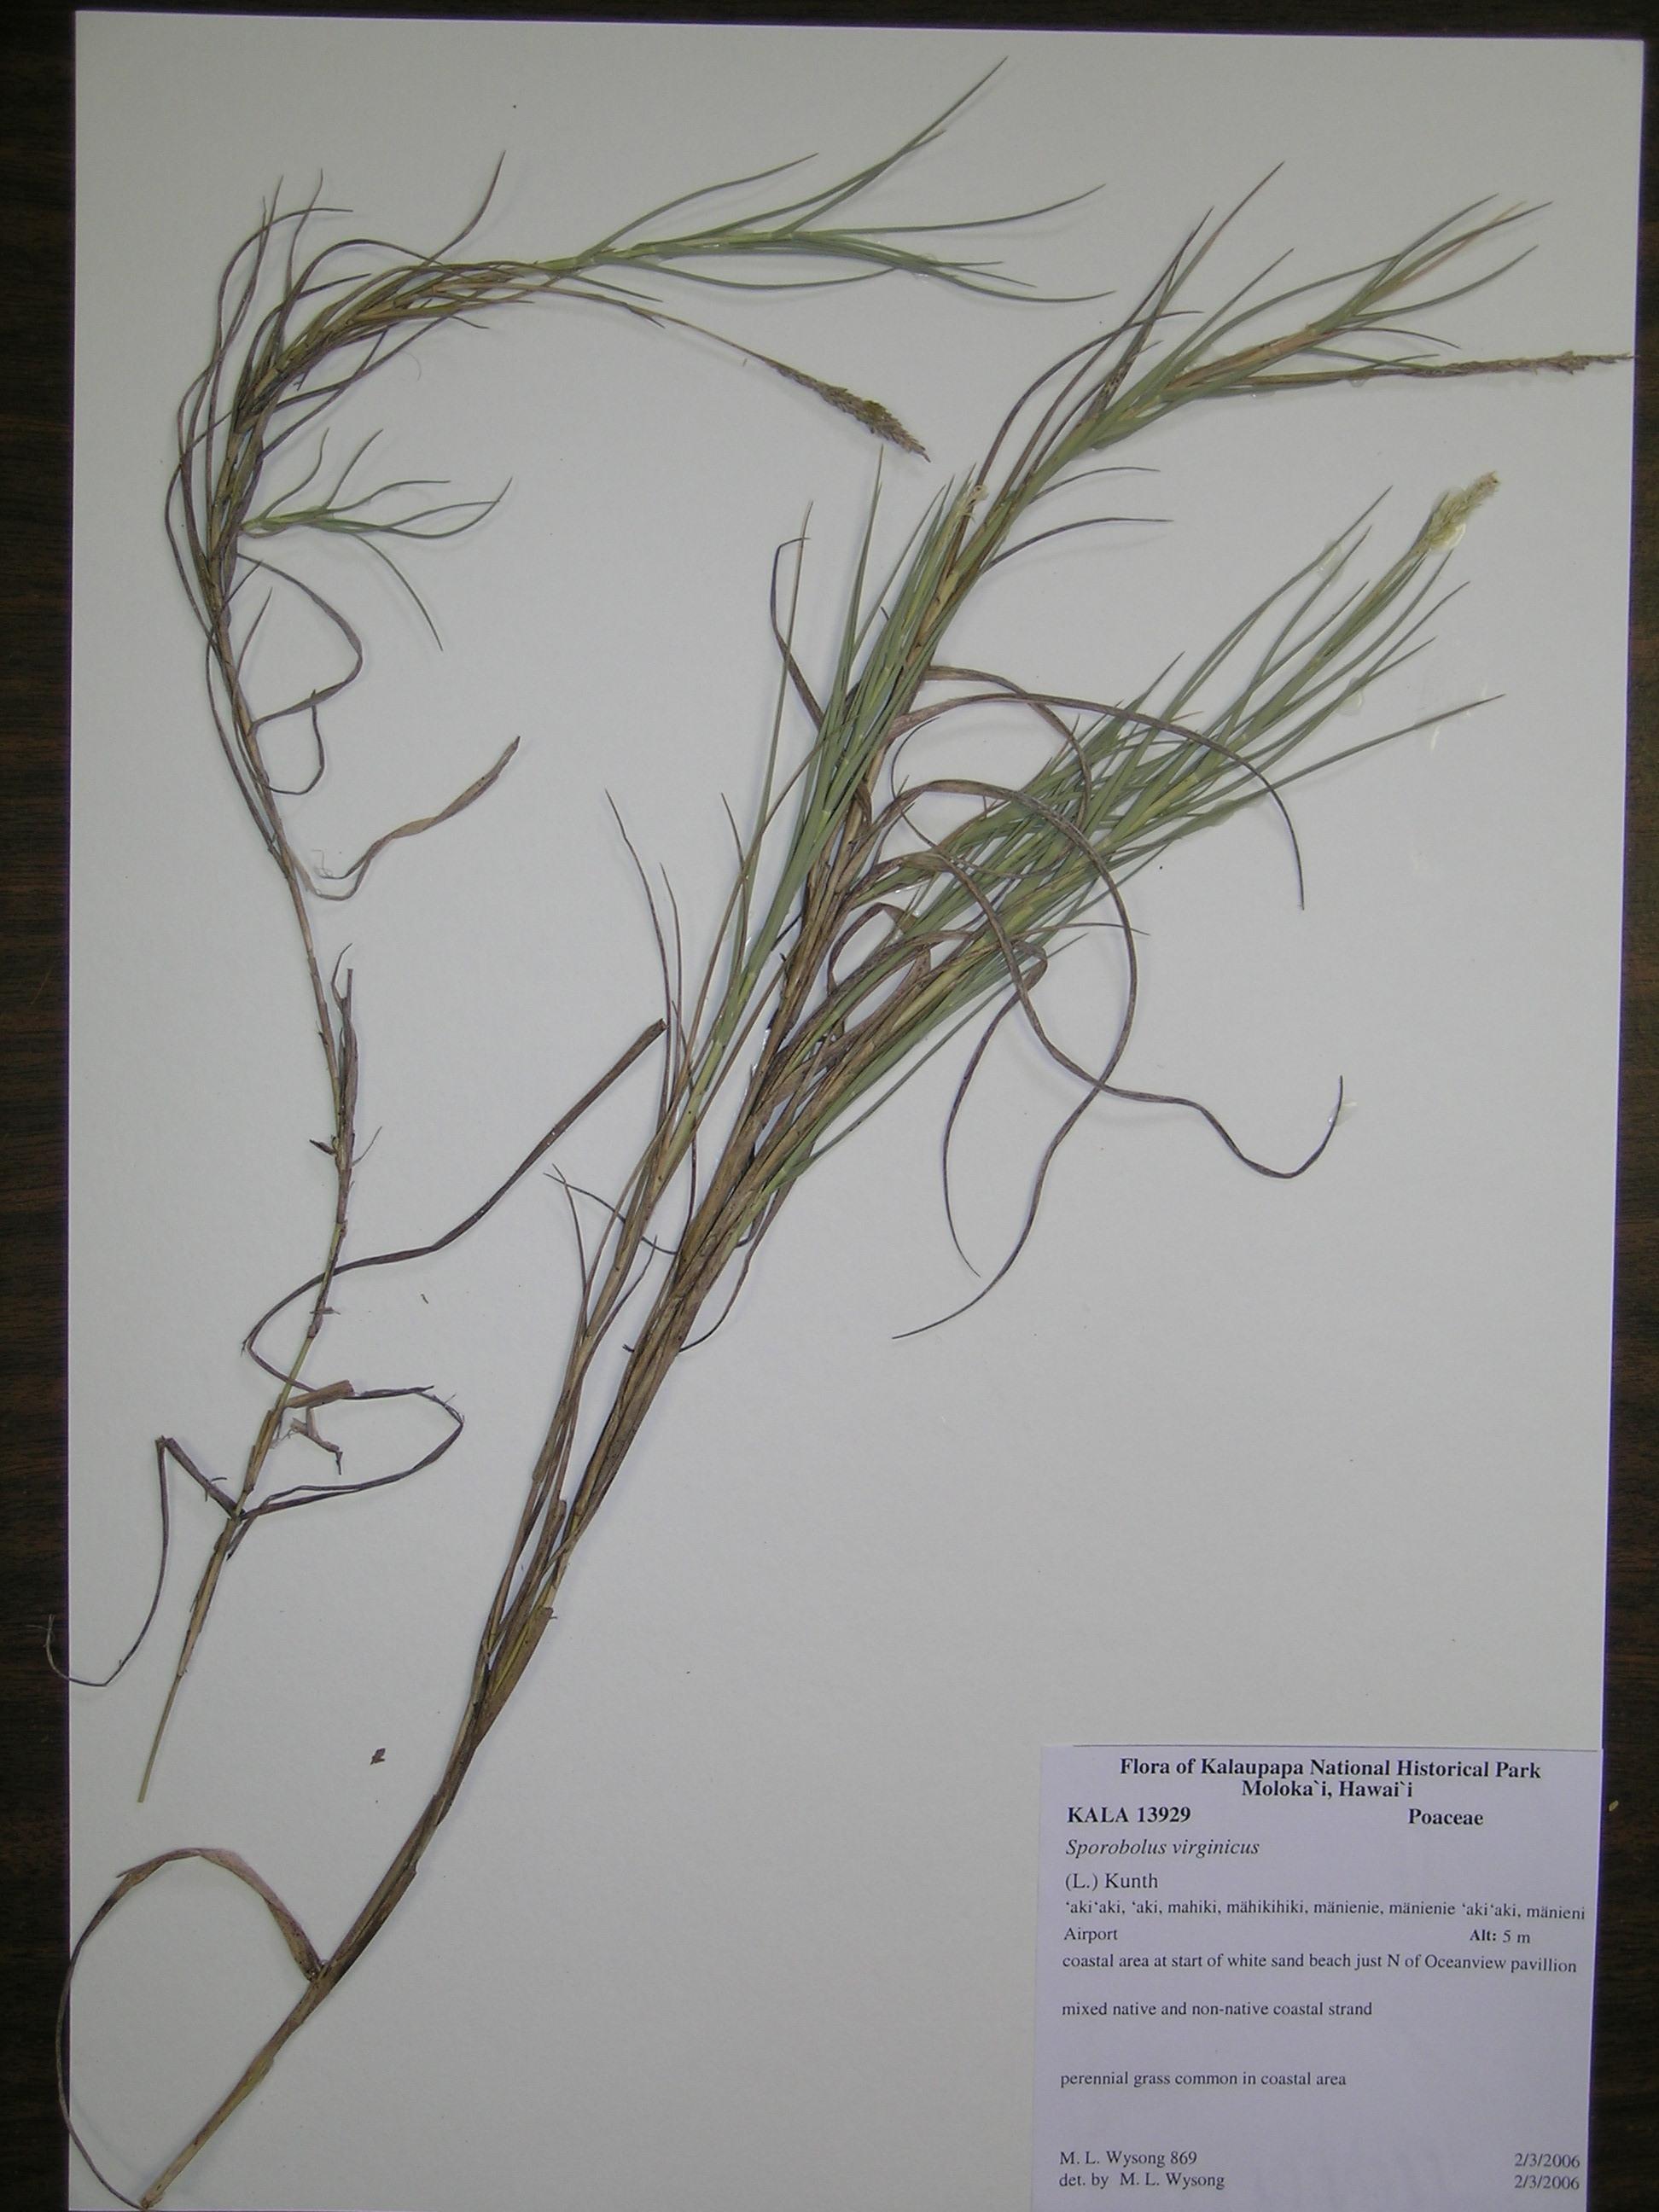 sporobolus virginicus voucher kala13929 sporobolus virginicus species    Sporobolus Virginicus